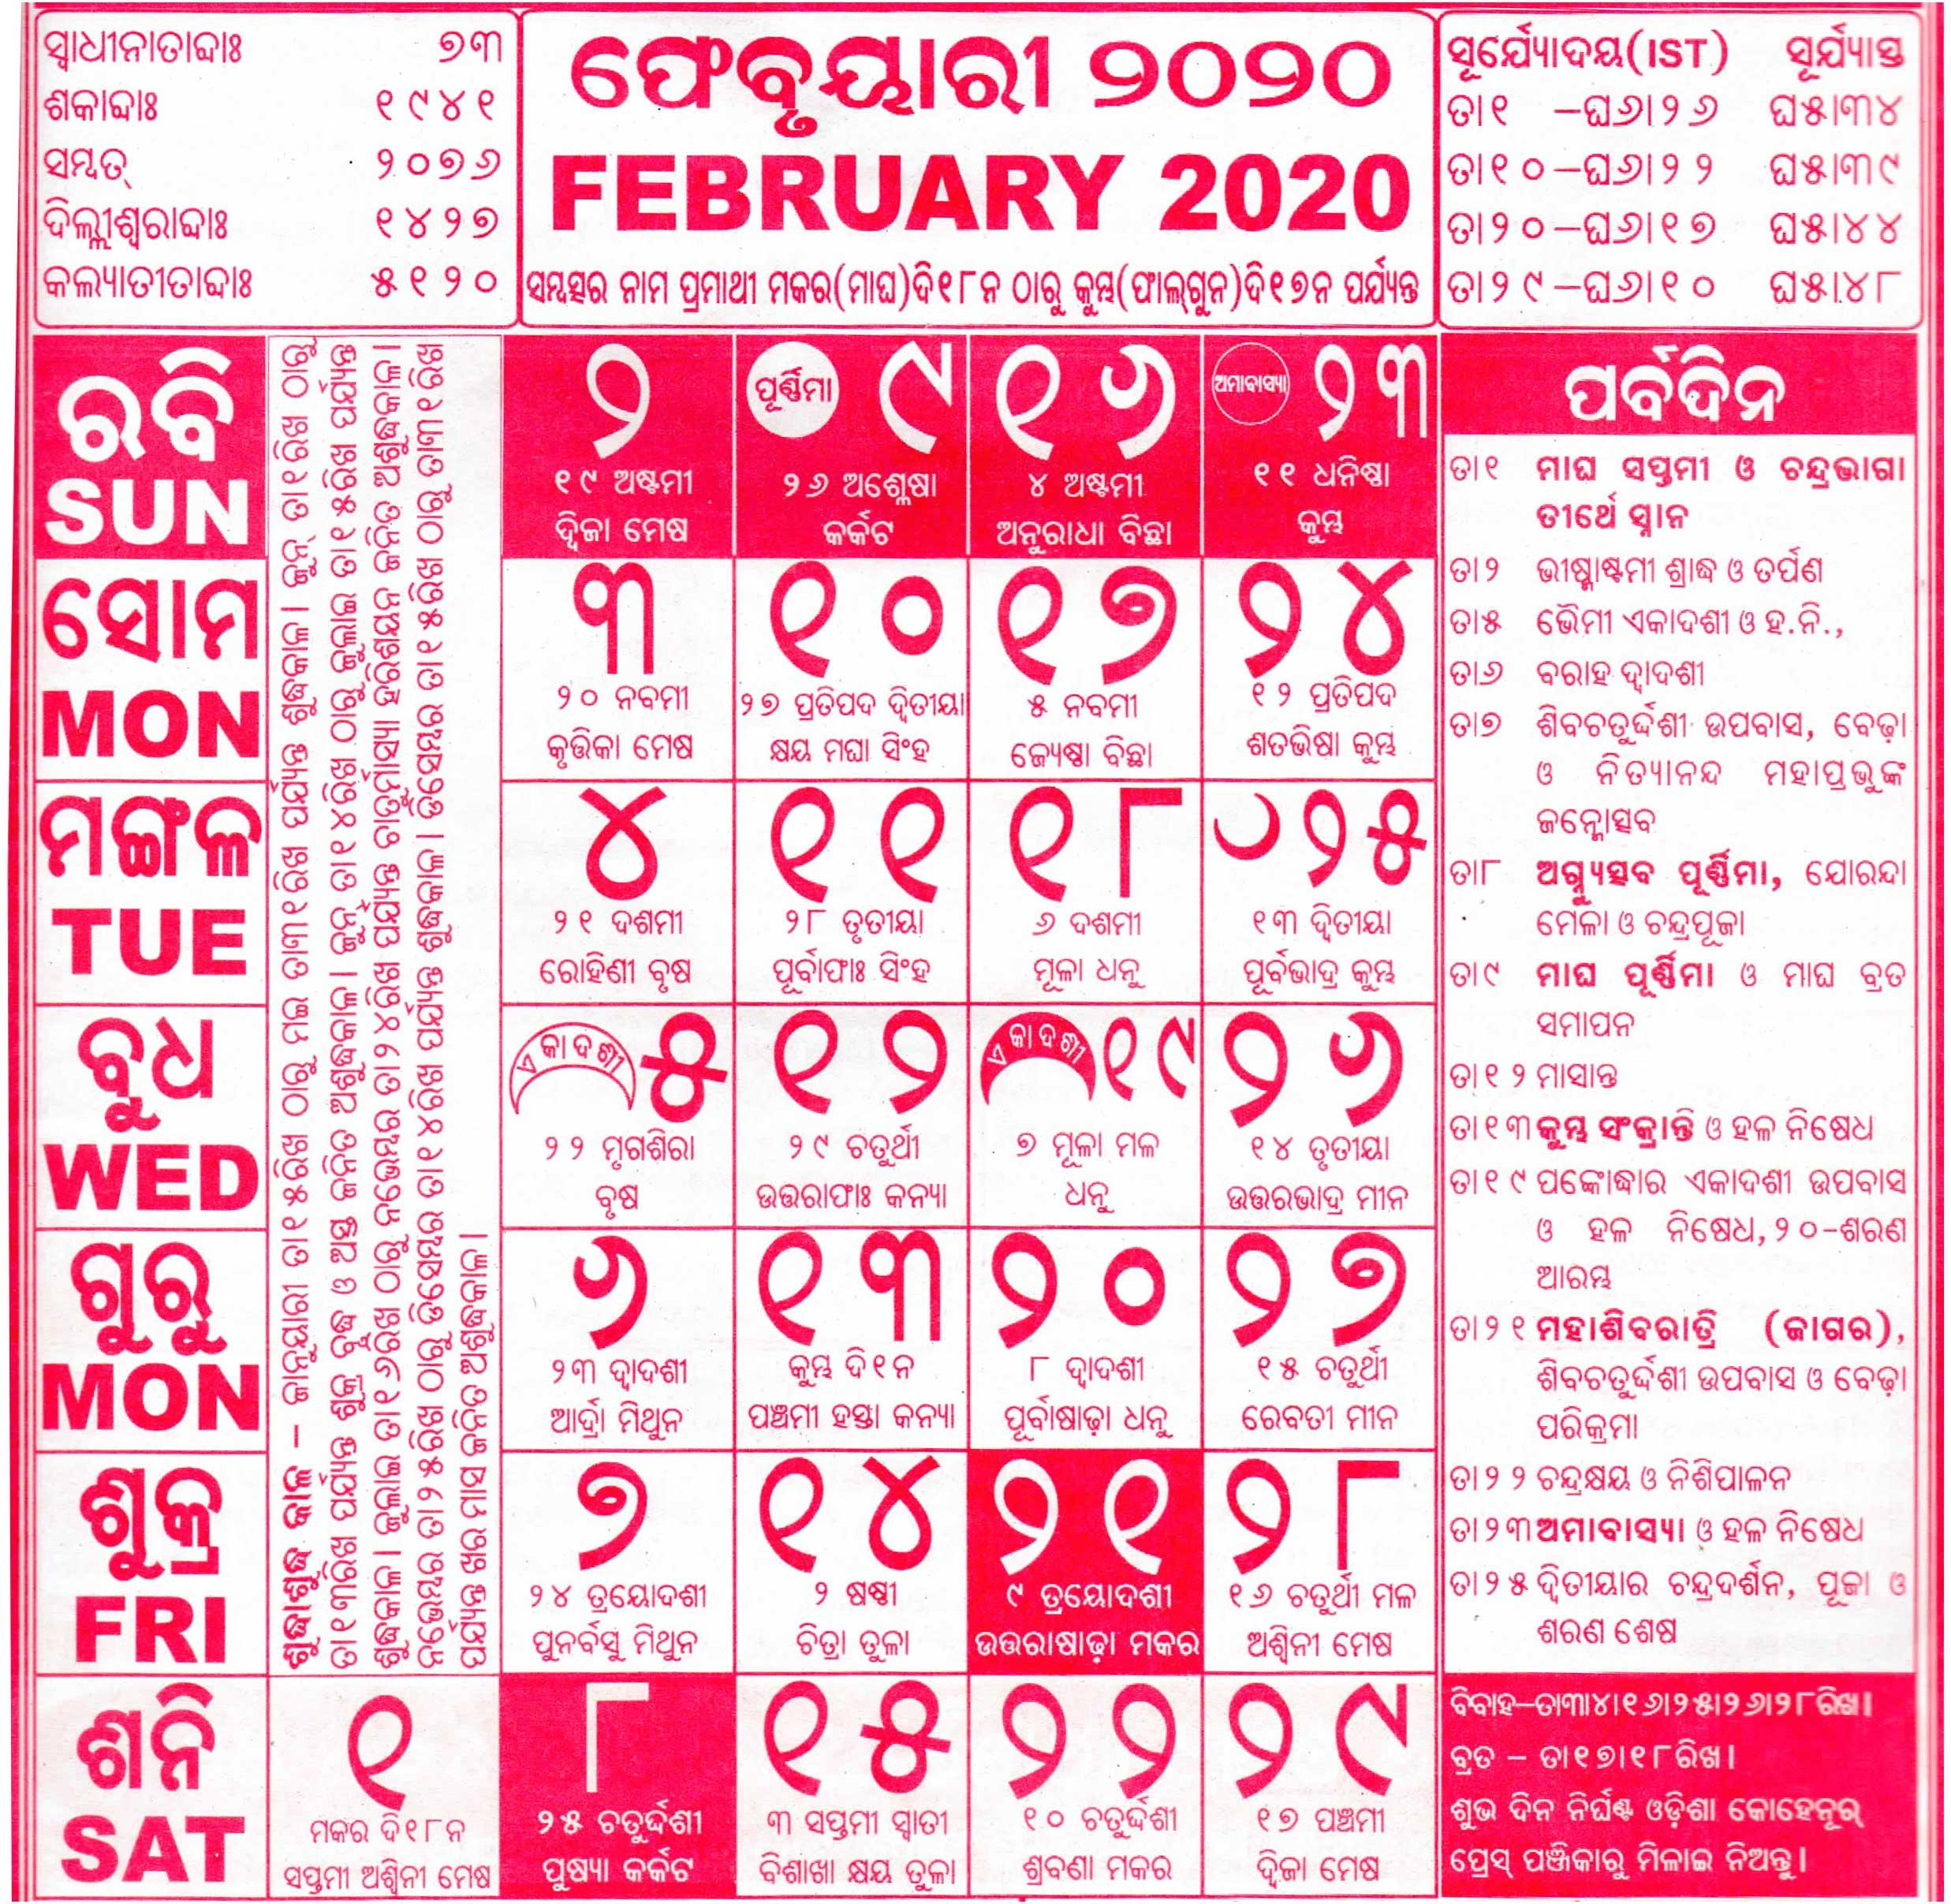 Oriya Calendar 2020 February